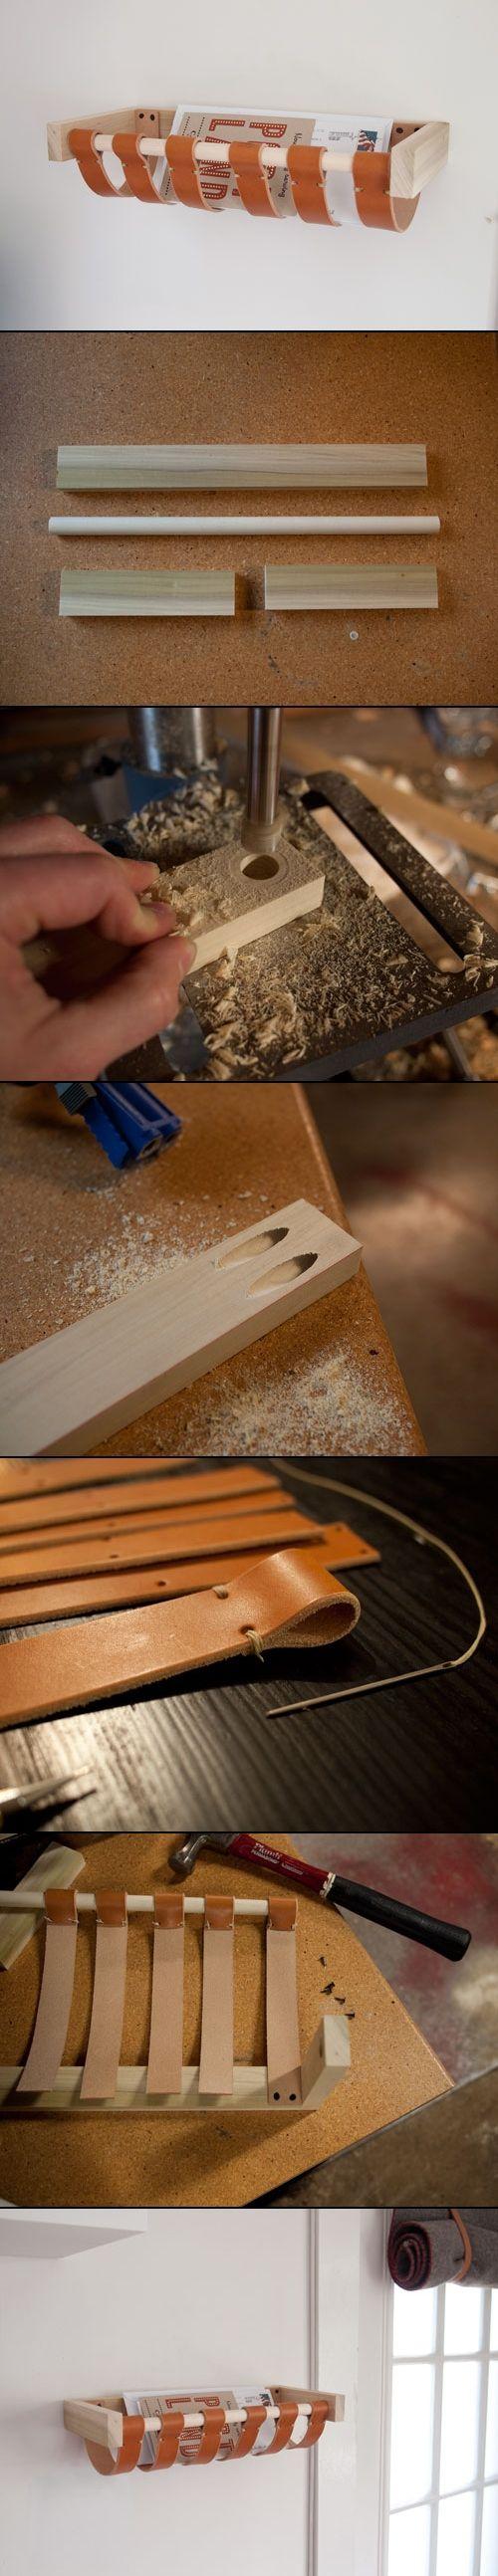 DIY PROJECT: MAIL BASKET